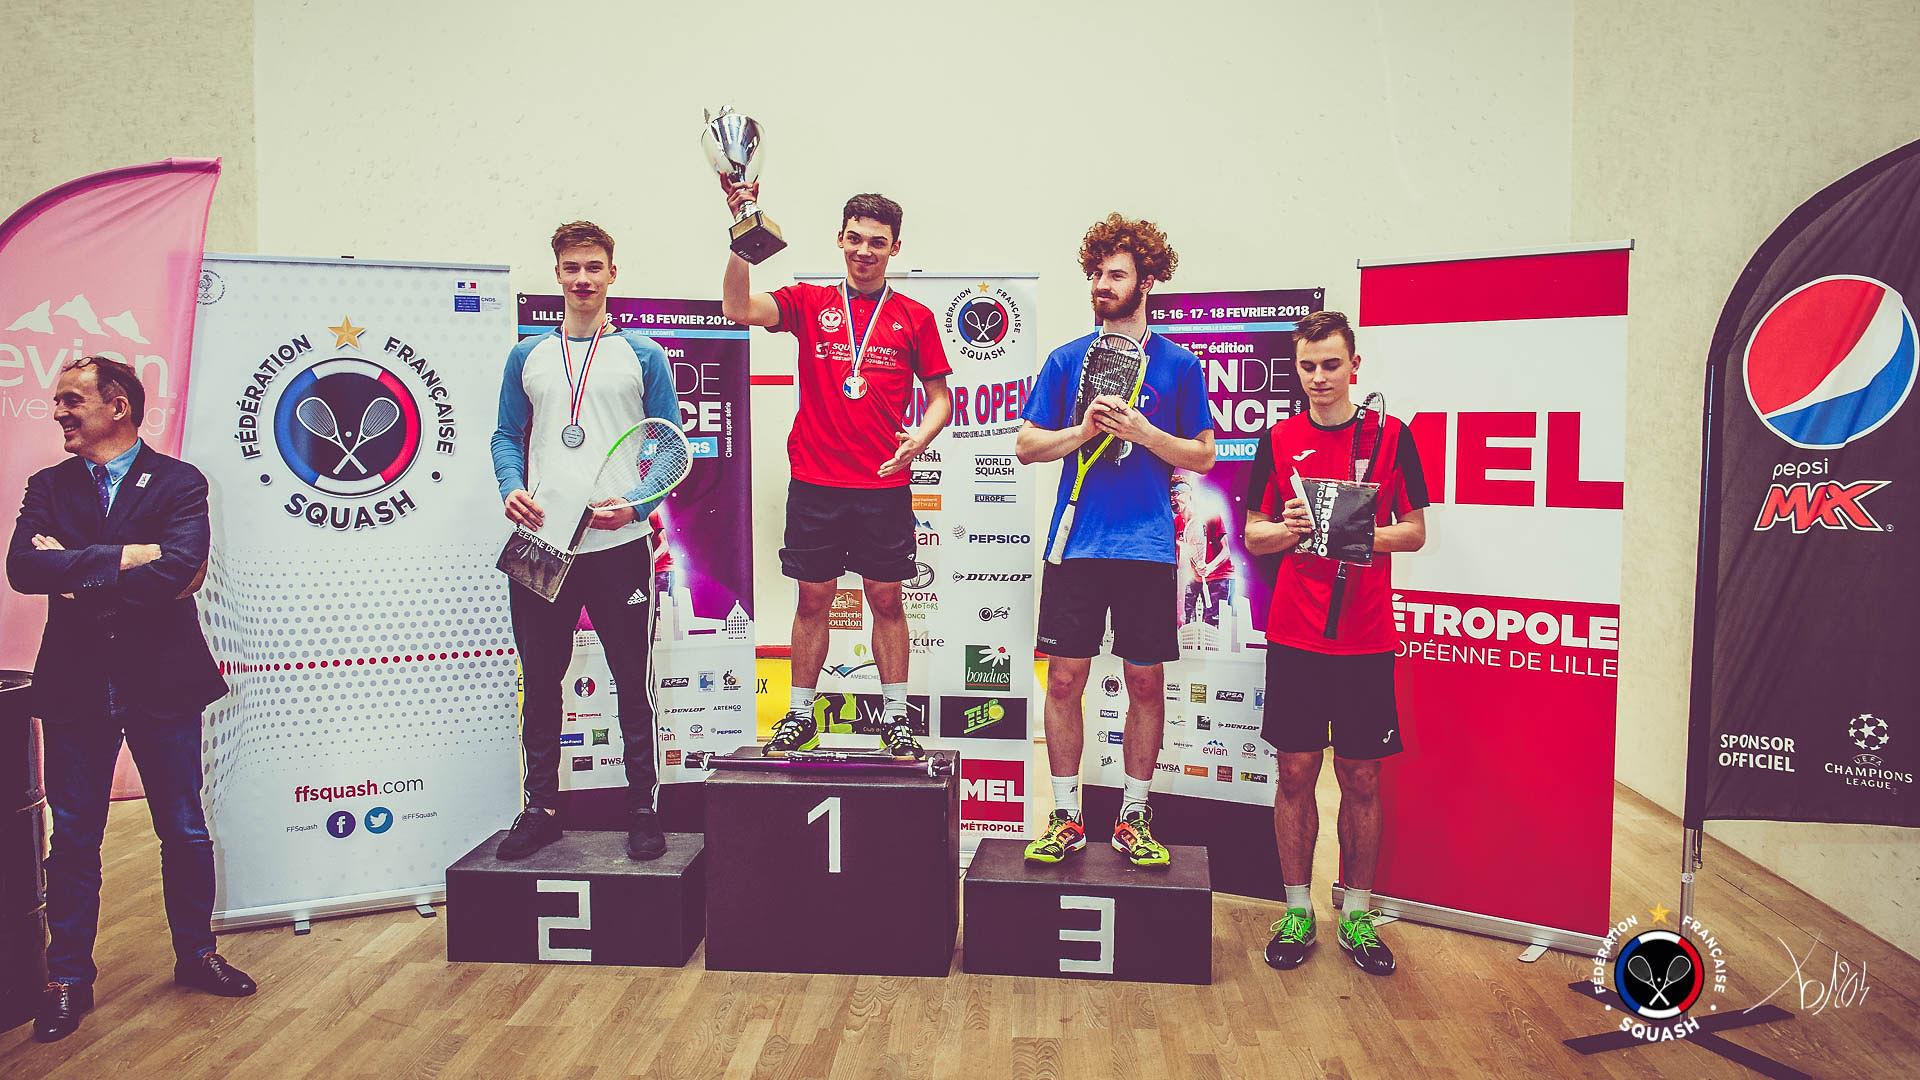 Championnat de squash